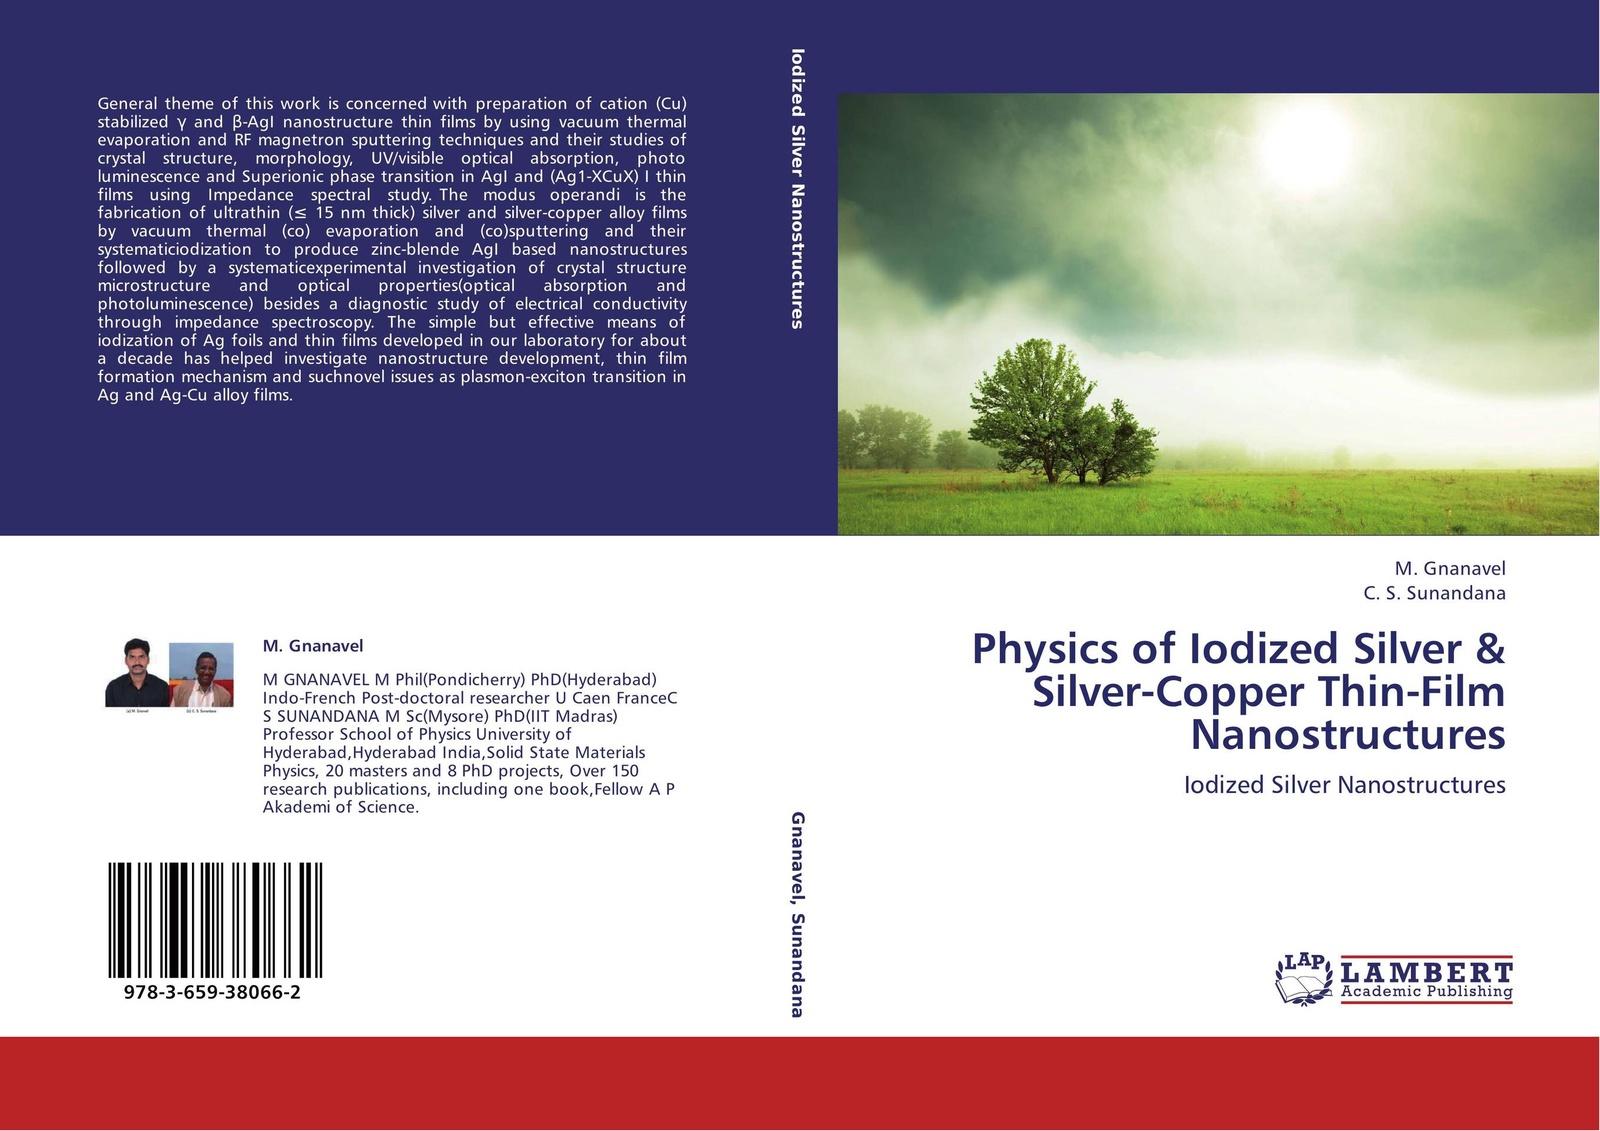 M. Gnanavel and C. S. Sunandana Physics of Iodized Silver & Silver-Copper Thin-Film Nanostructures kazi hussain a study of copper indium di sulfide semiconductor thin films